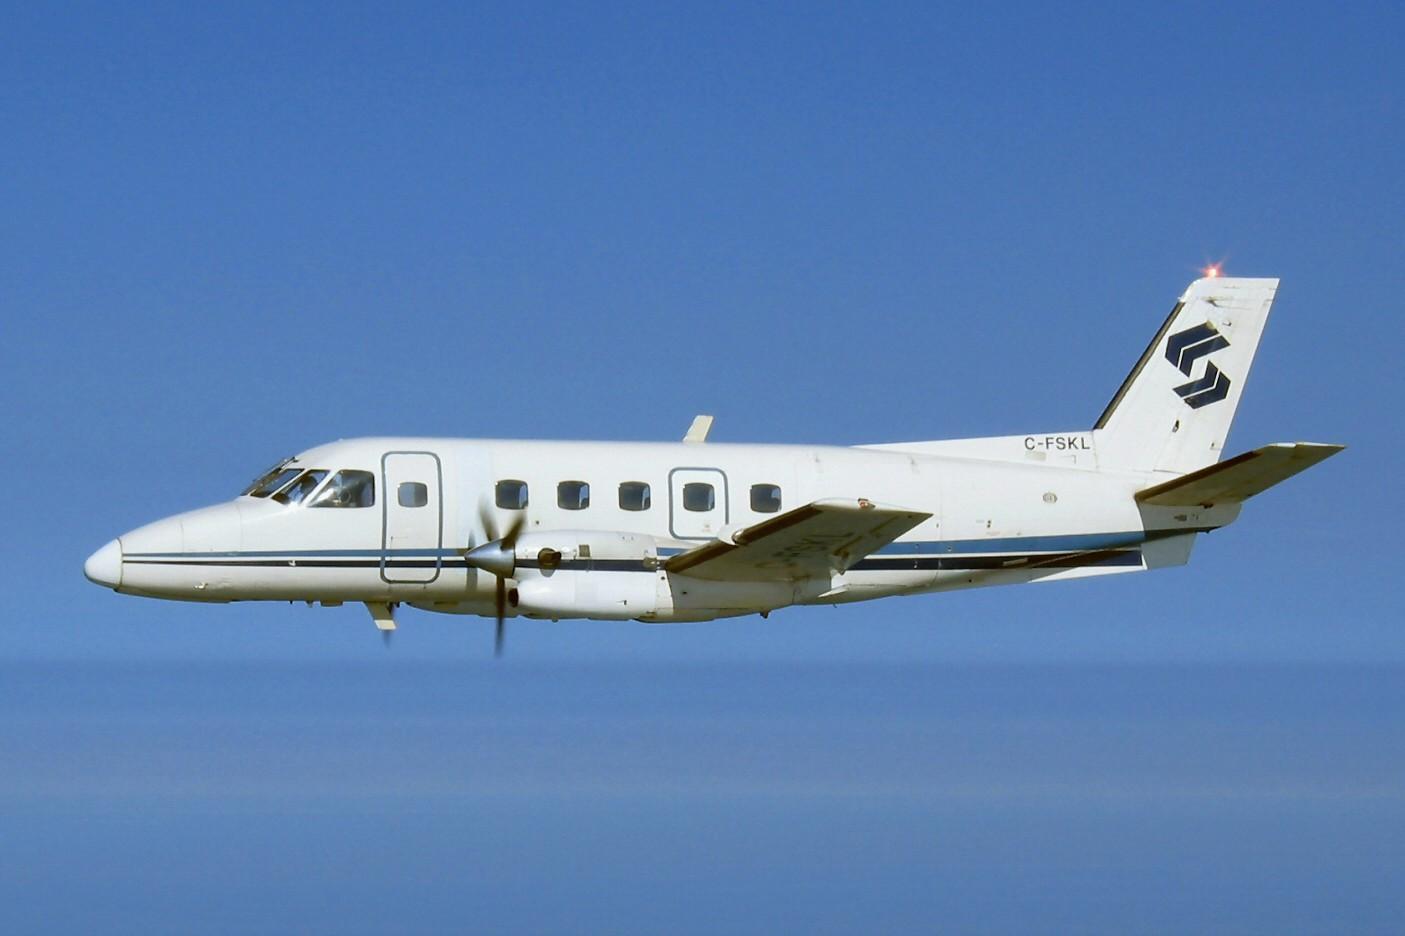 Embraer EMB 110 Bandeirante - Wikipedia